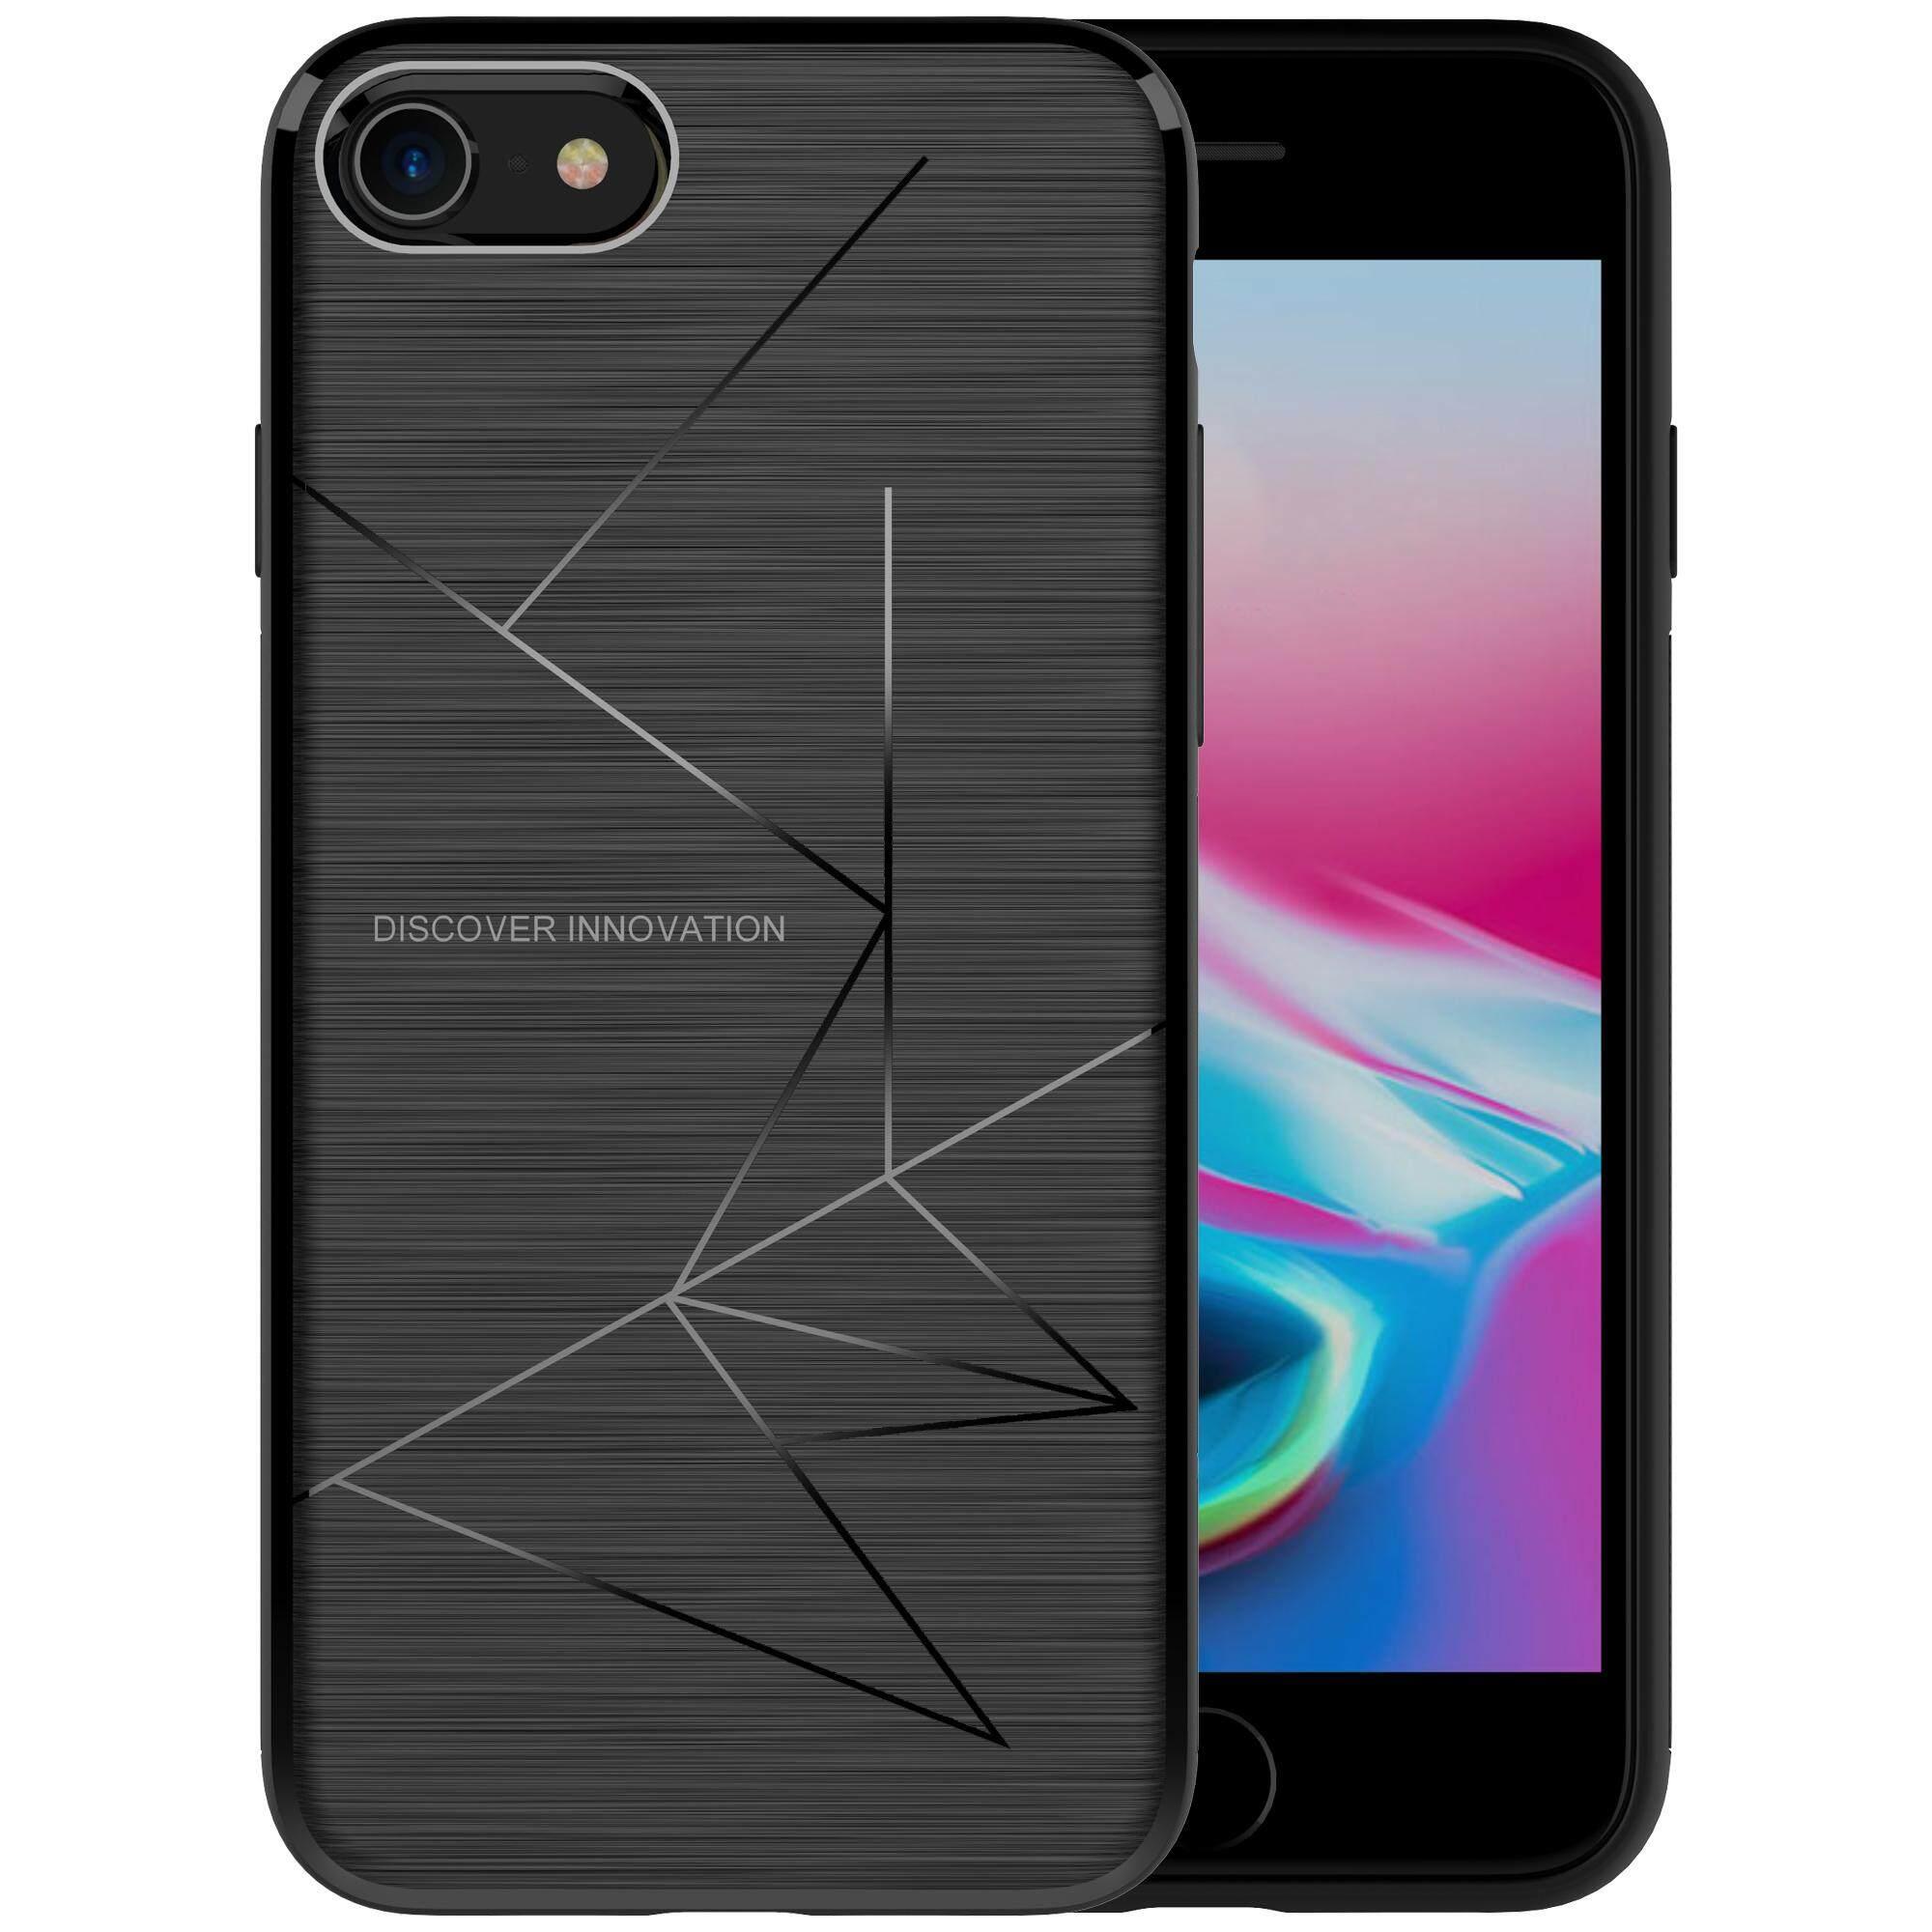 NILLKIN Magic Case untuk iPhone 8 Lembut TPU Pengisi Daya Nirkabel QI Receiver TPU Casing Belakang